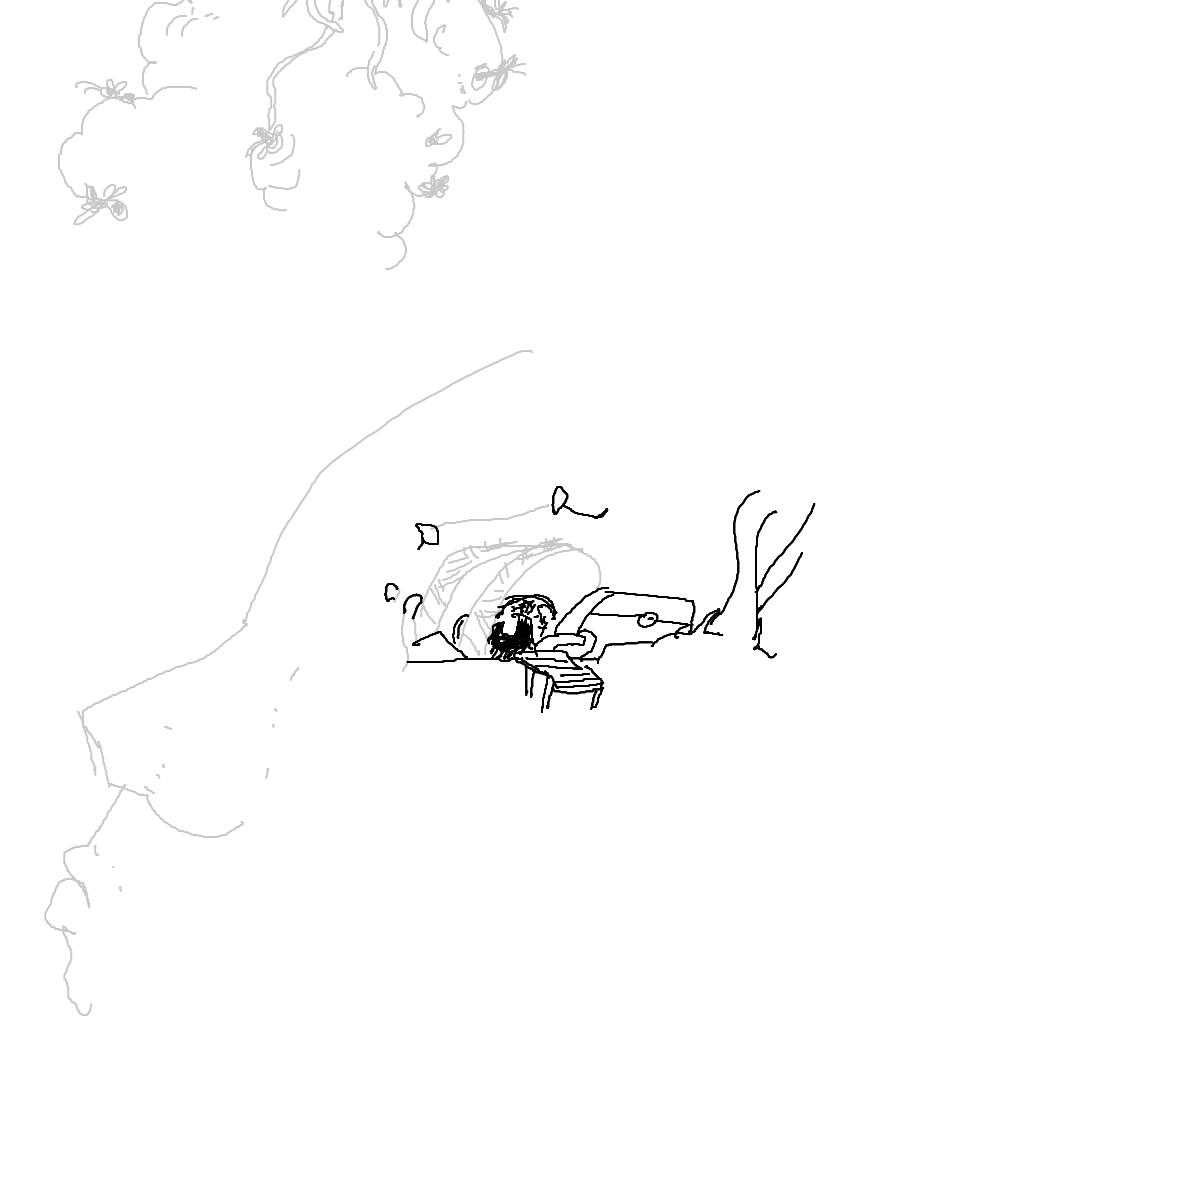 BAAAM drawing#22270 lat:78.4174575805664000lng: -4.4291119575500490